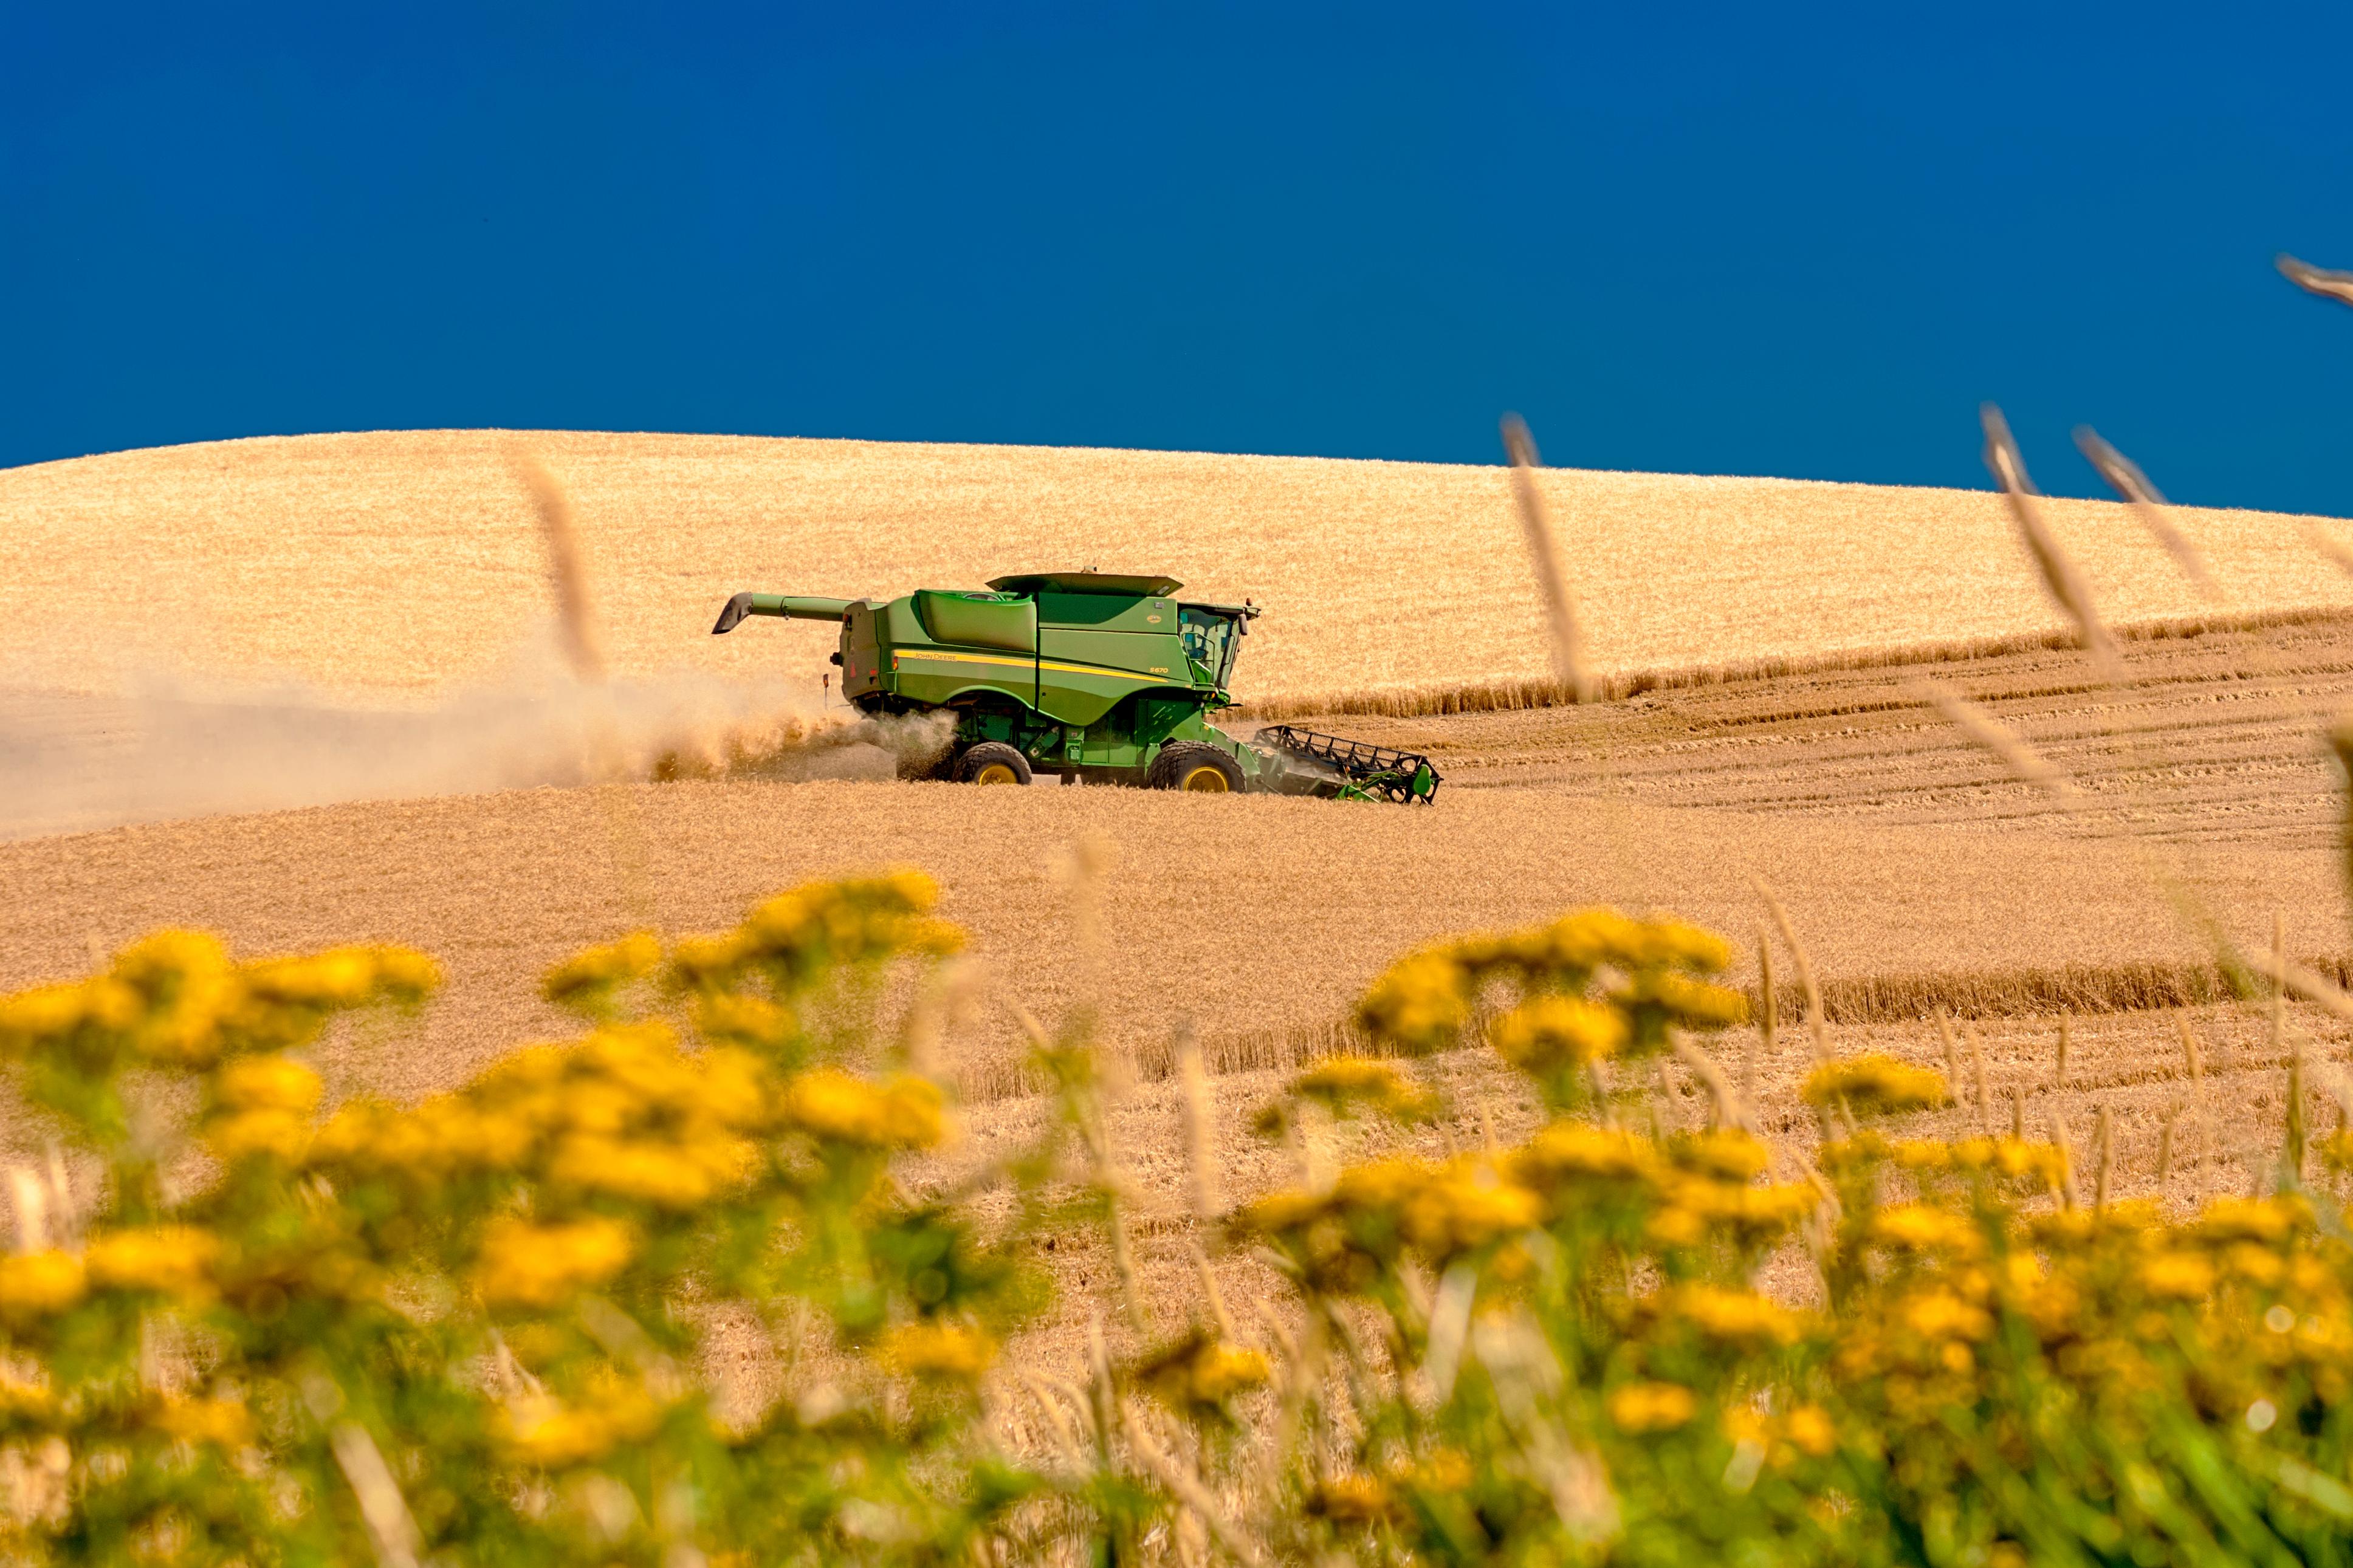 A harvester works a grain field